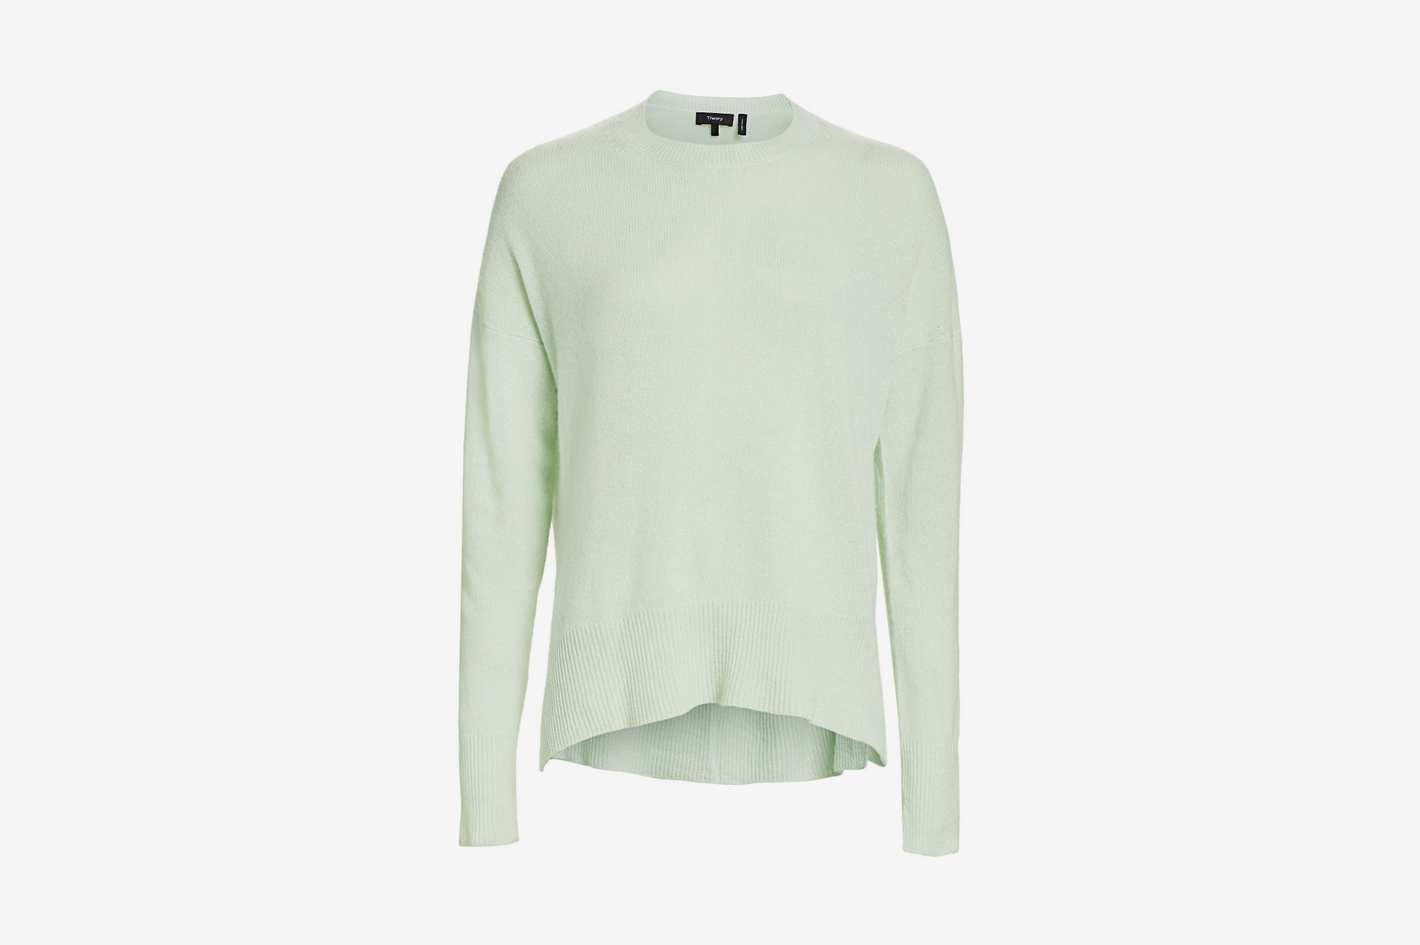 Theory Karenia Cashmere Knit Top, Opal Green